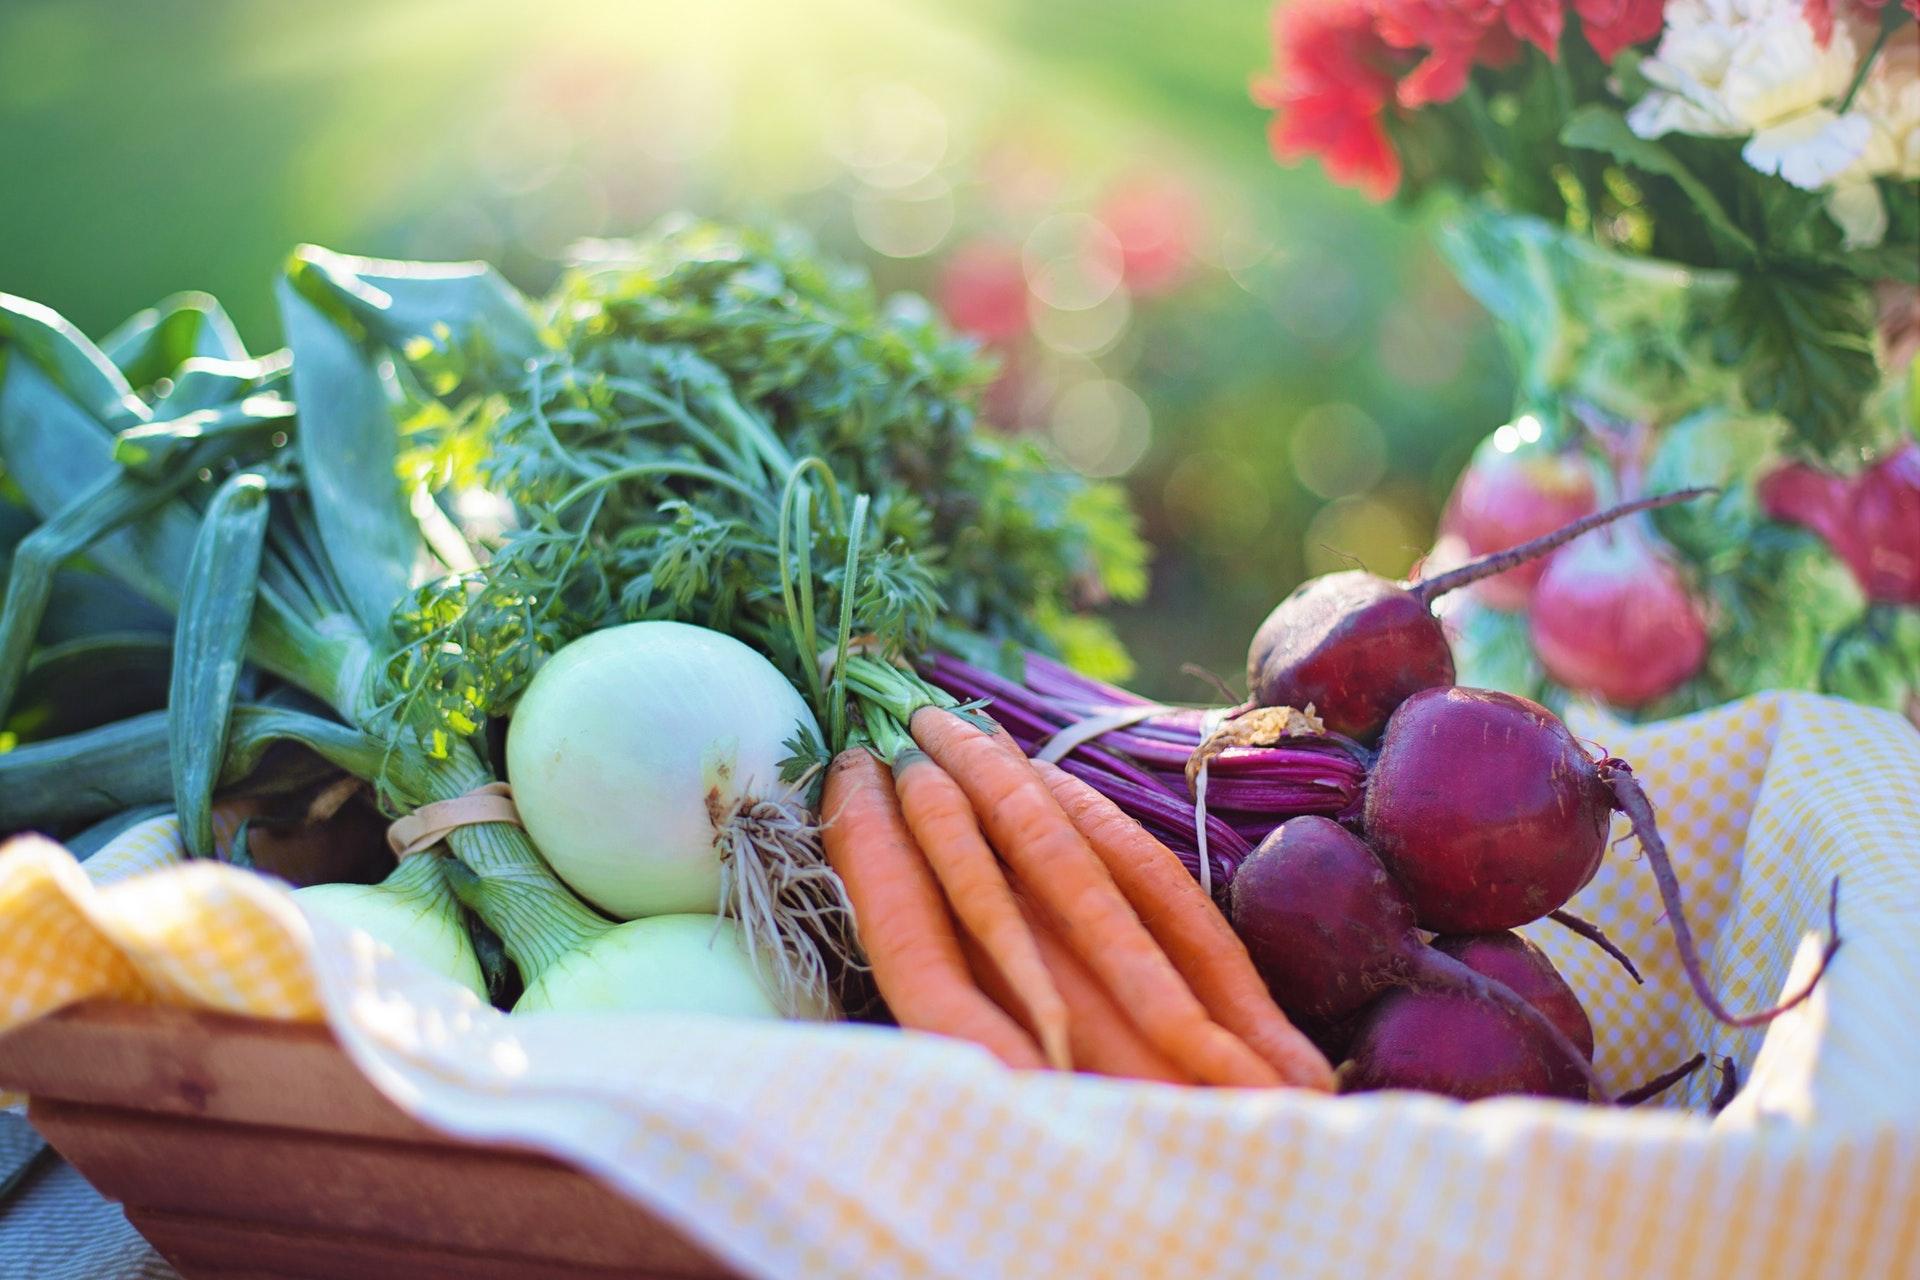 Enjoy delicious seasonal produce this holiday season.